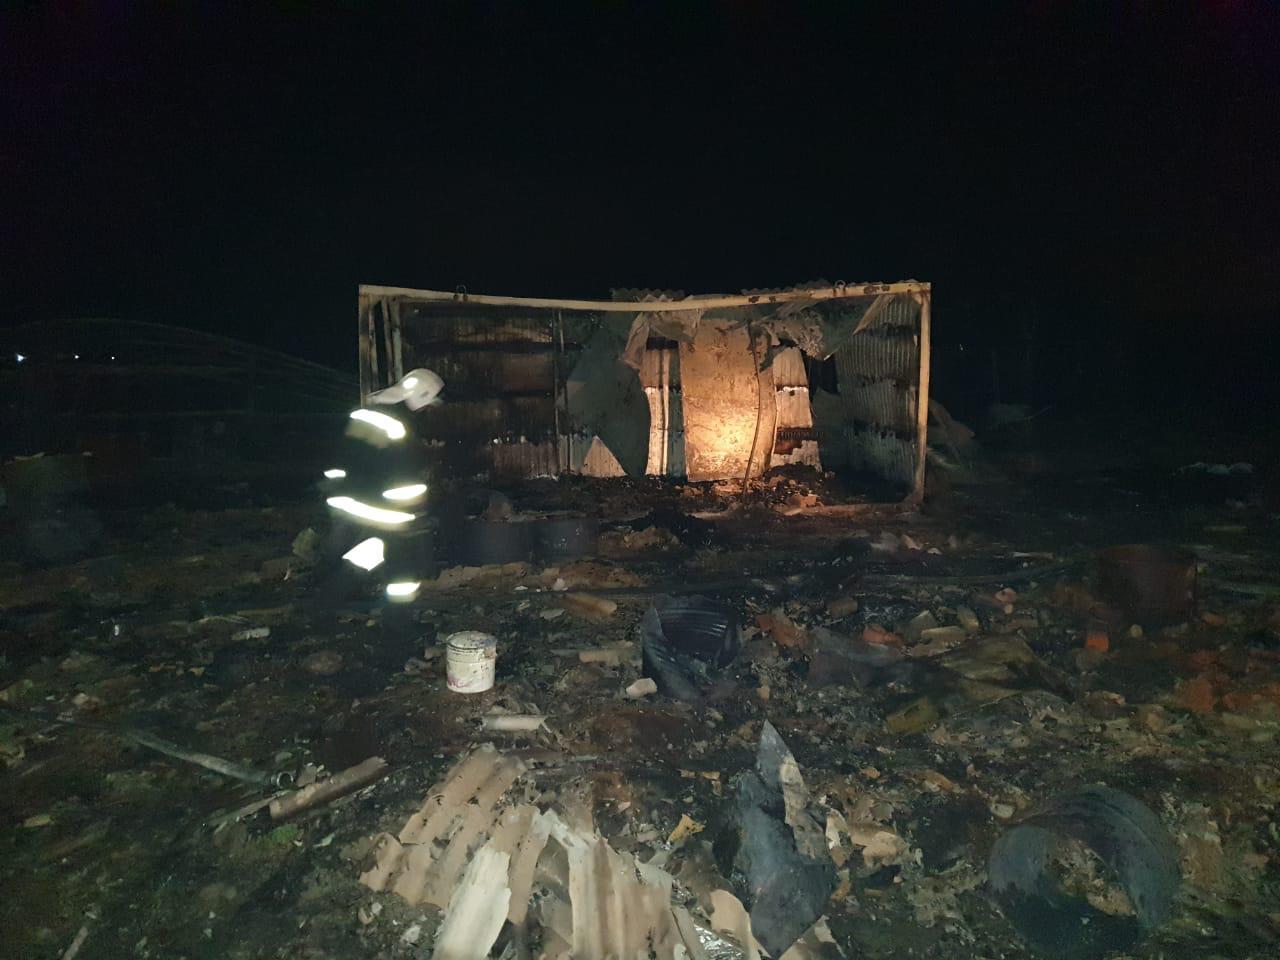 На Кубани сгорели заживо четыре человека